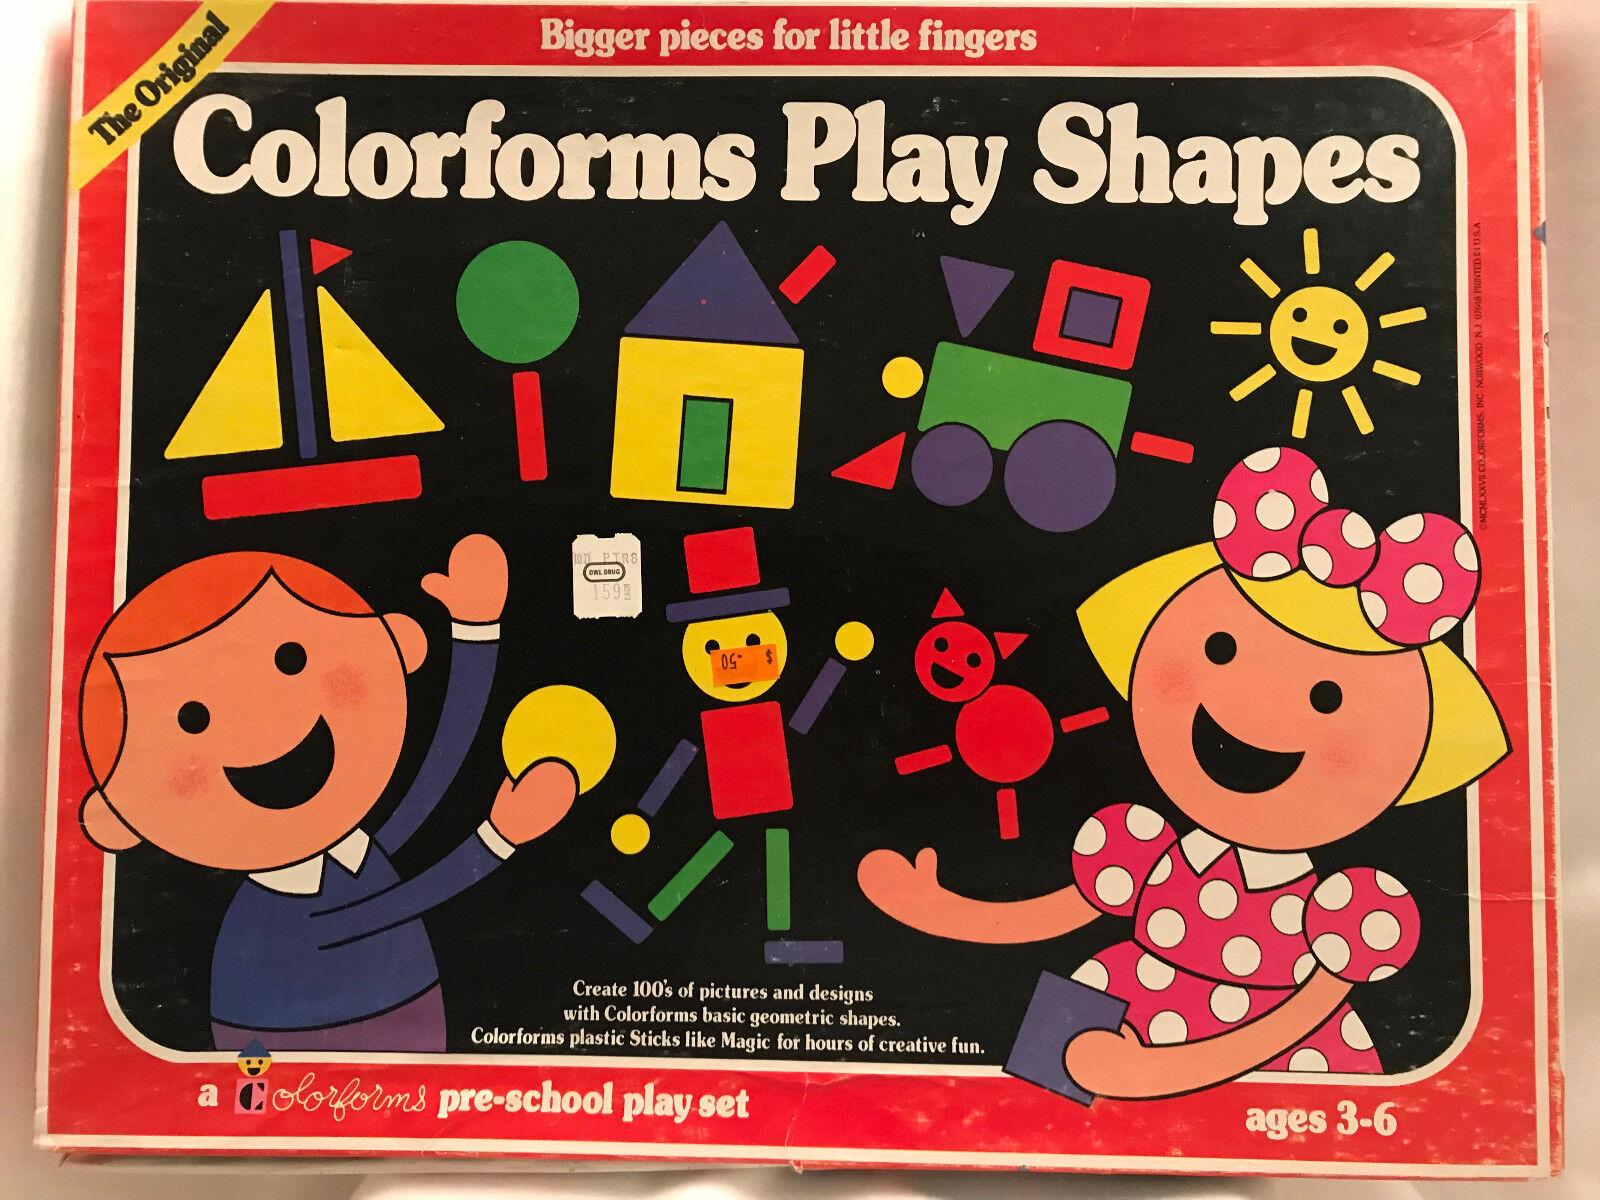 Vintage Original colorforms Play Set Set Set Shapes Primary colors Game Classic Toy 1977 78c169